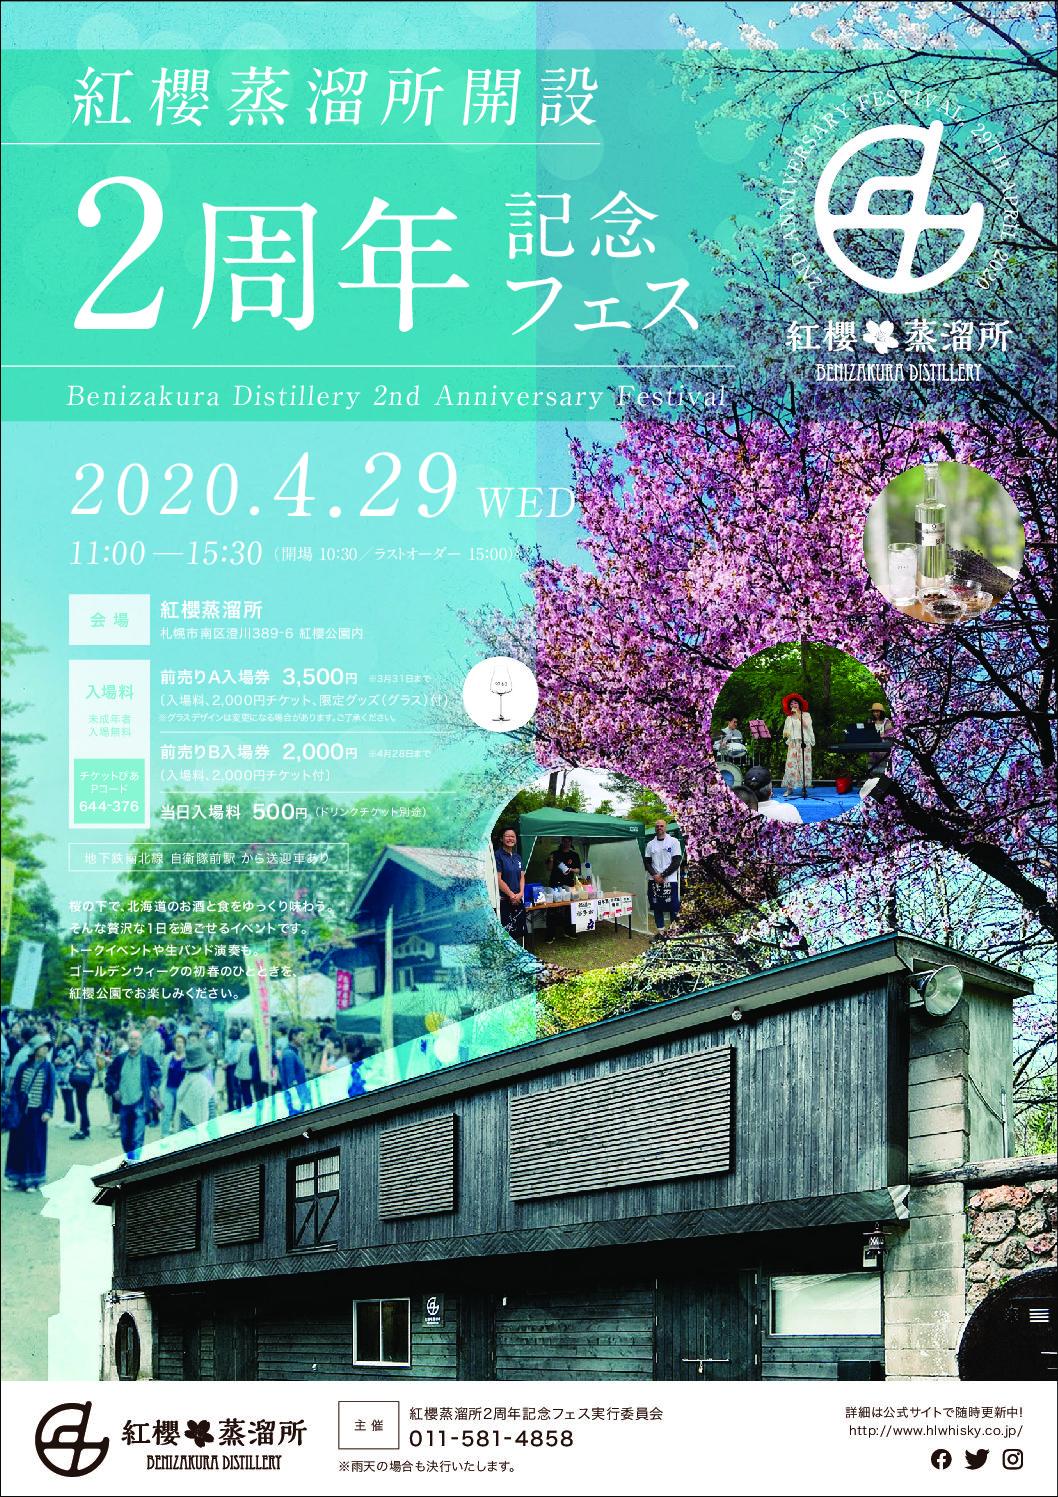 紅櫻蒸溜所2周年記念イベント開催決定!